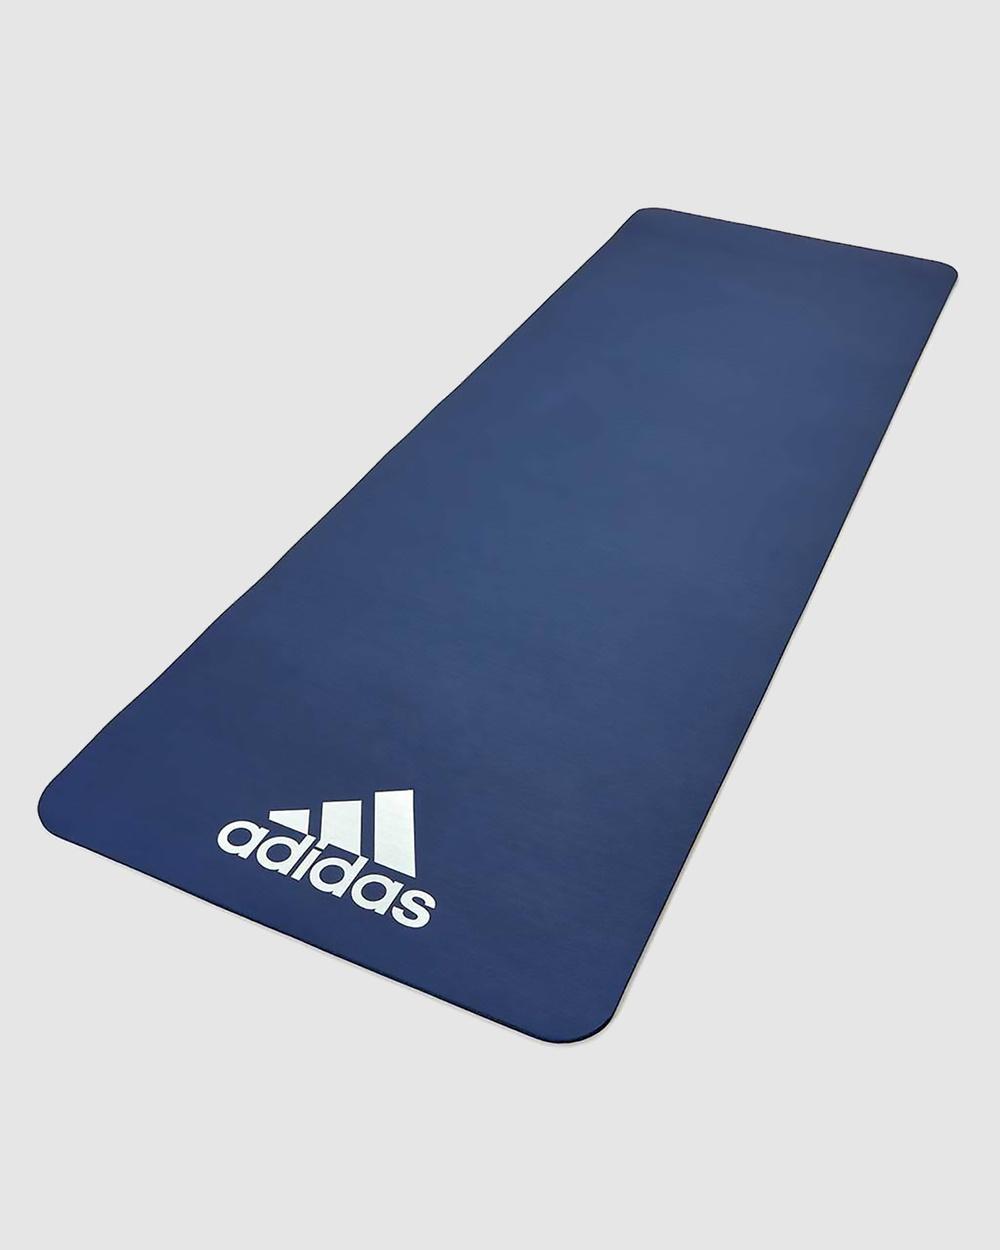 Adidas 7mm Fitness Mat Training Equipment Blue